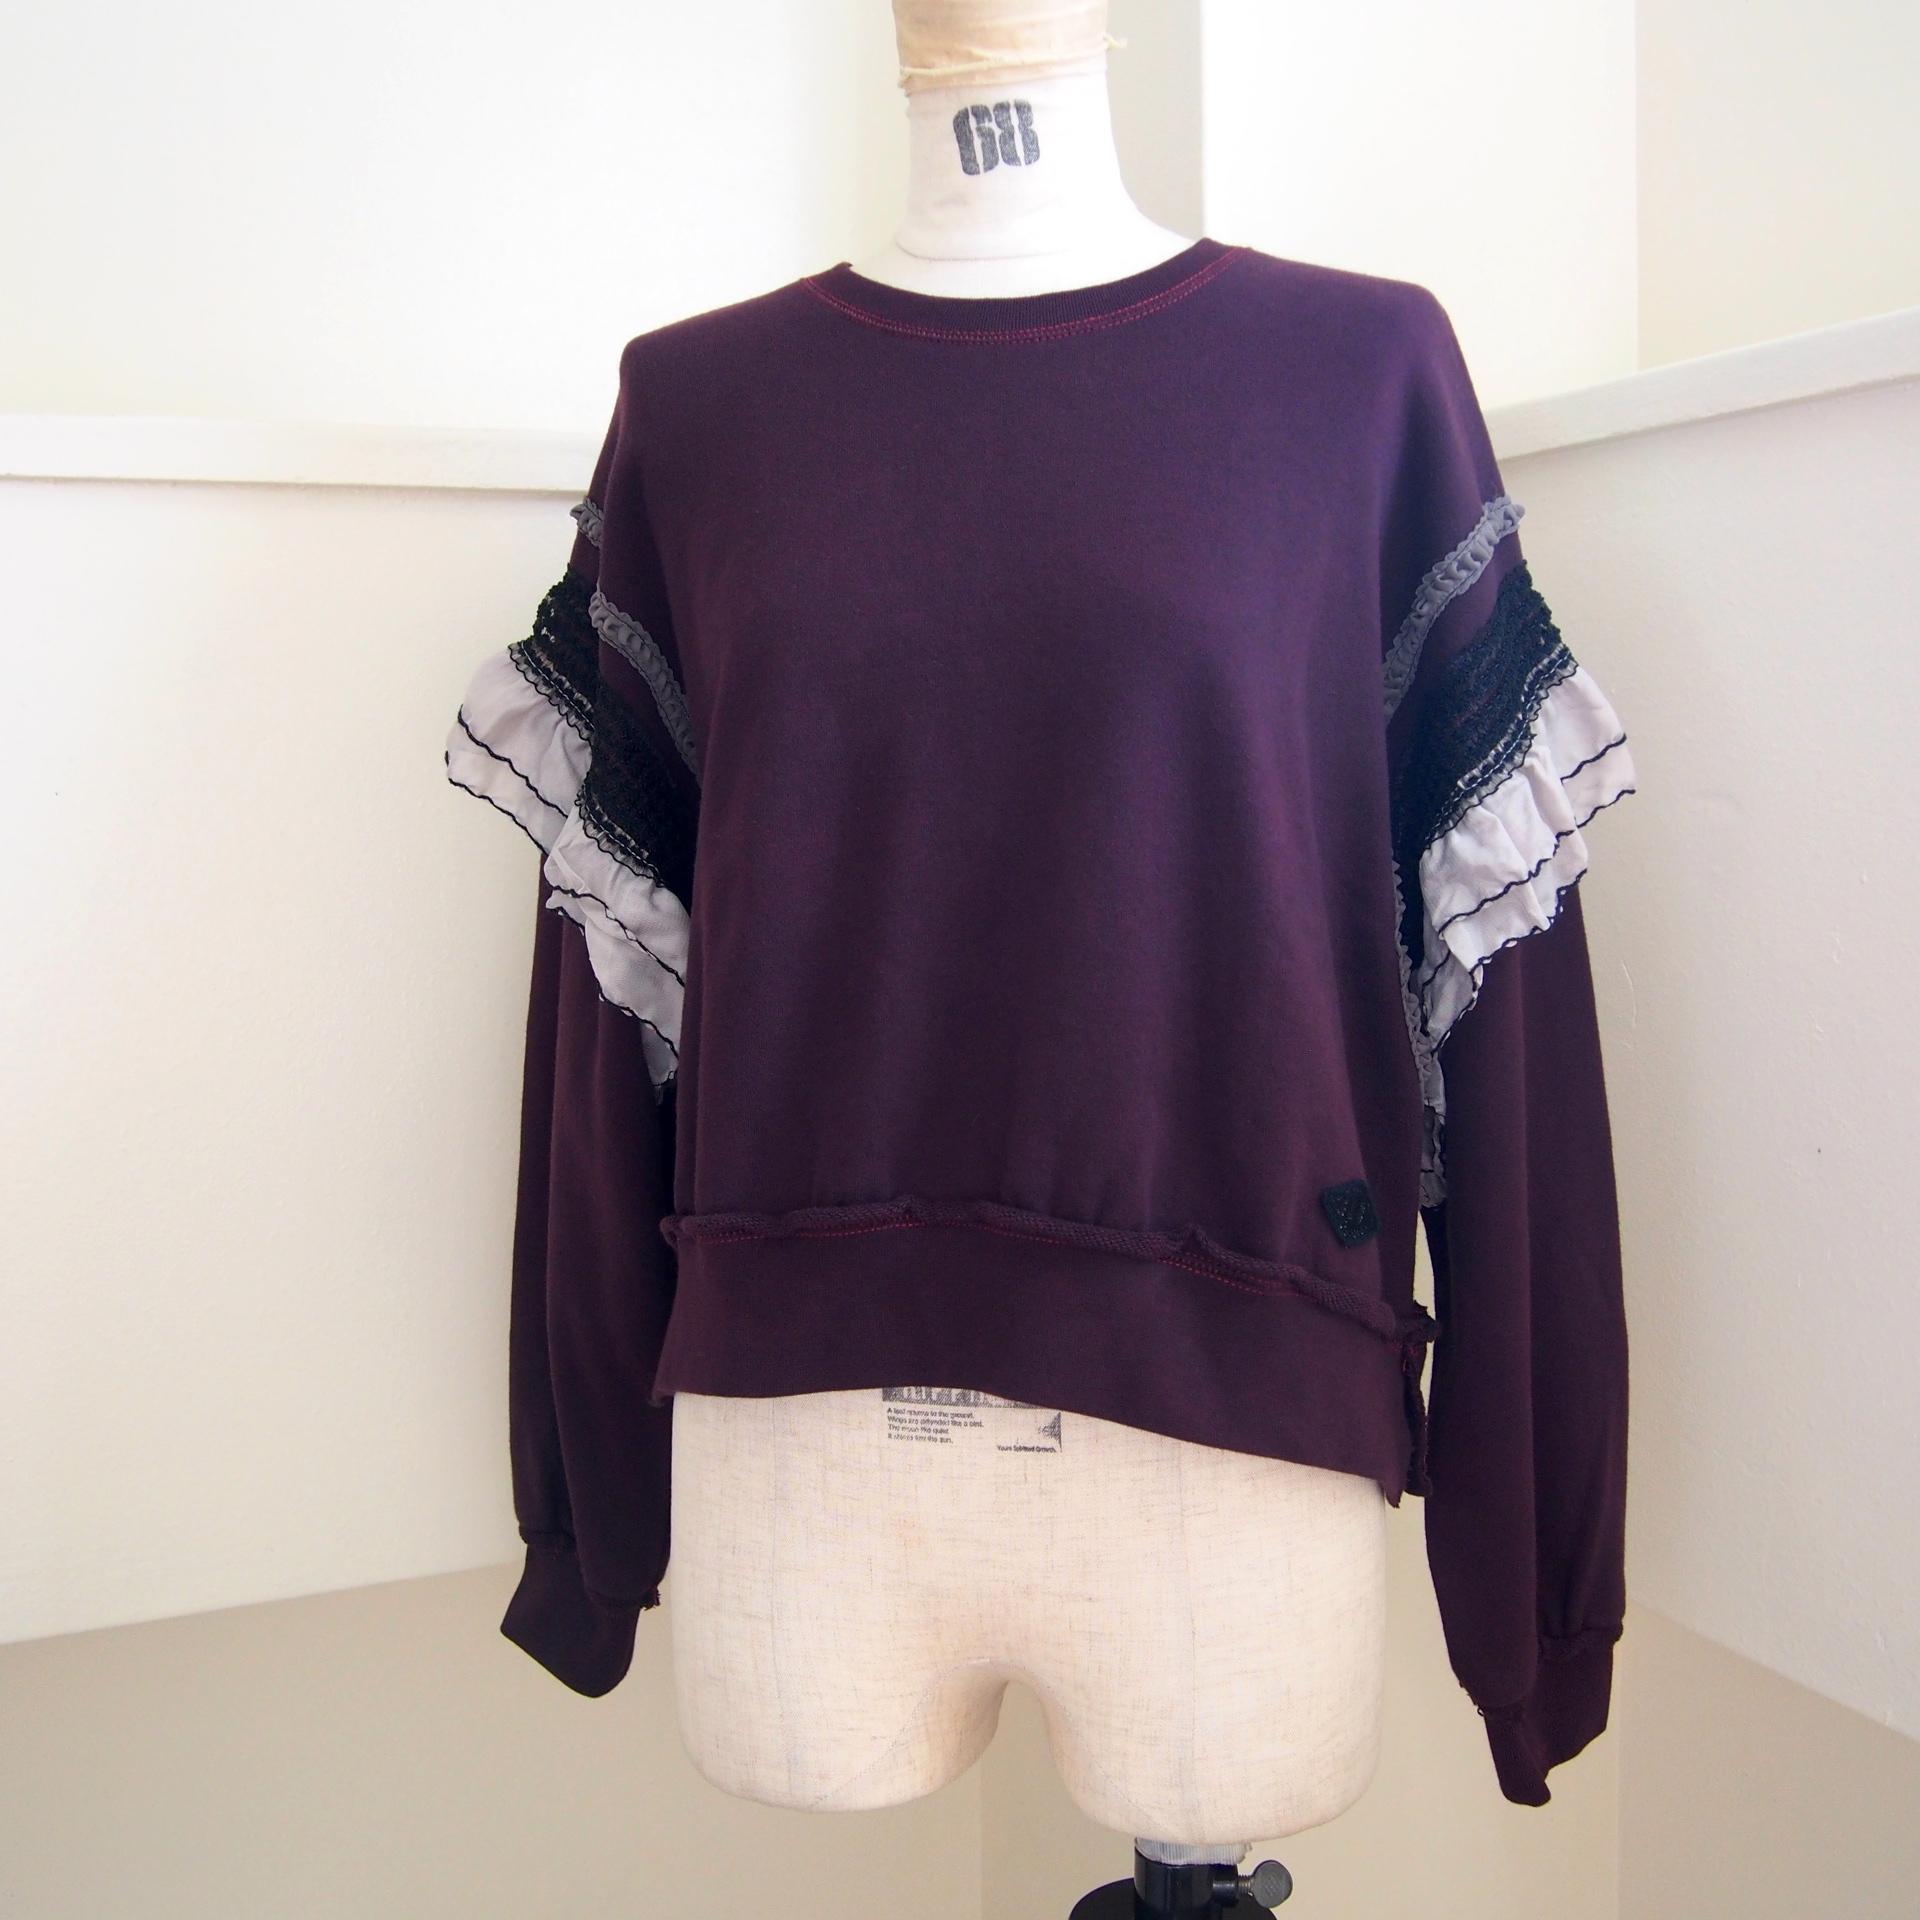 【RehersalL】 pleats shoulder pullover (wine) /【リハーズオール】プリーツショルダープルオーバー(ワイン)